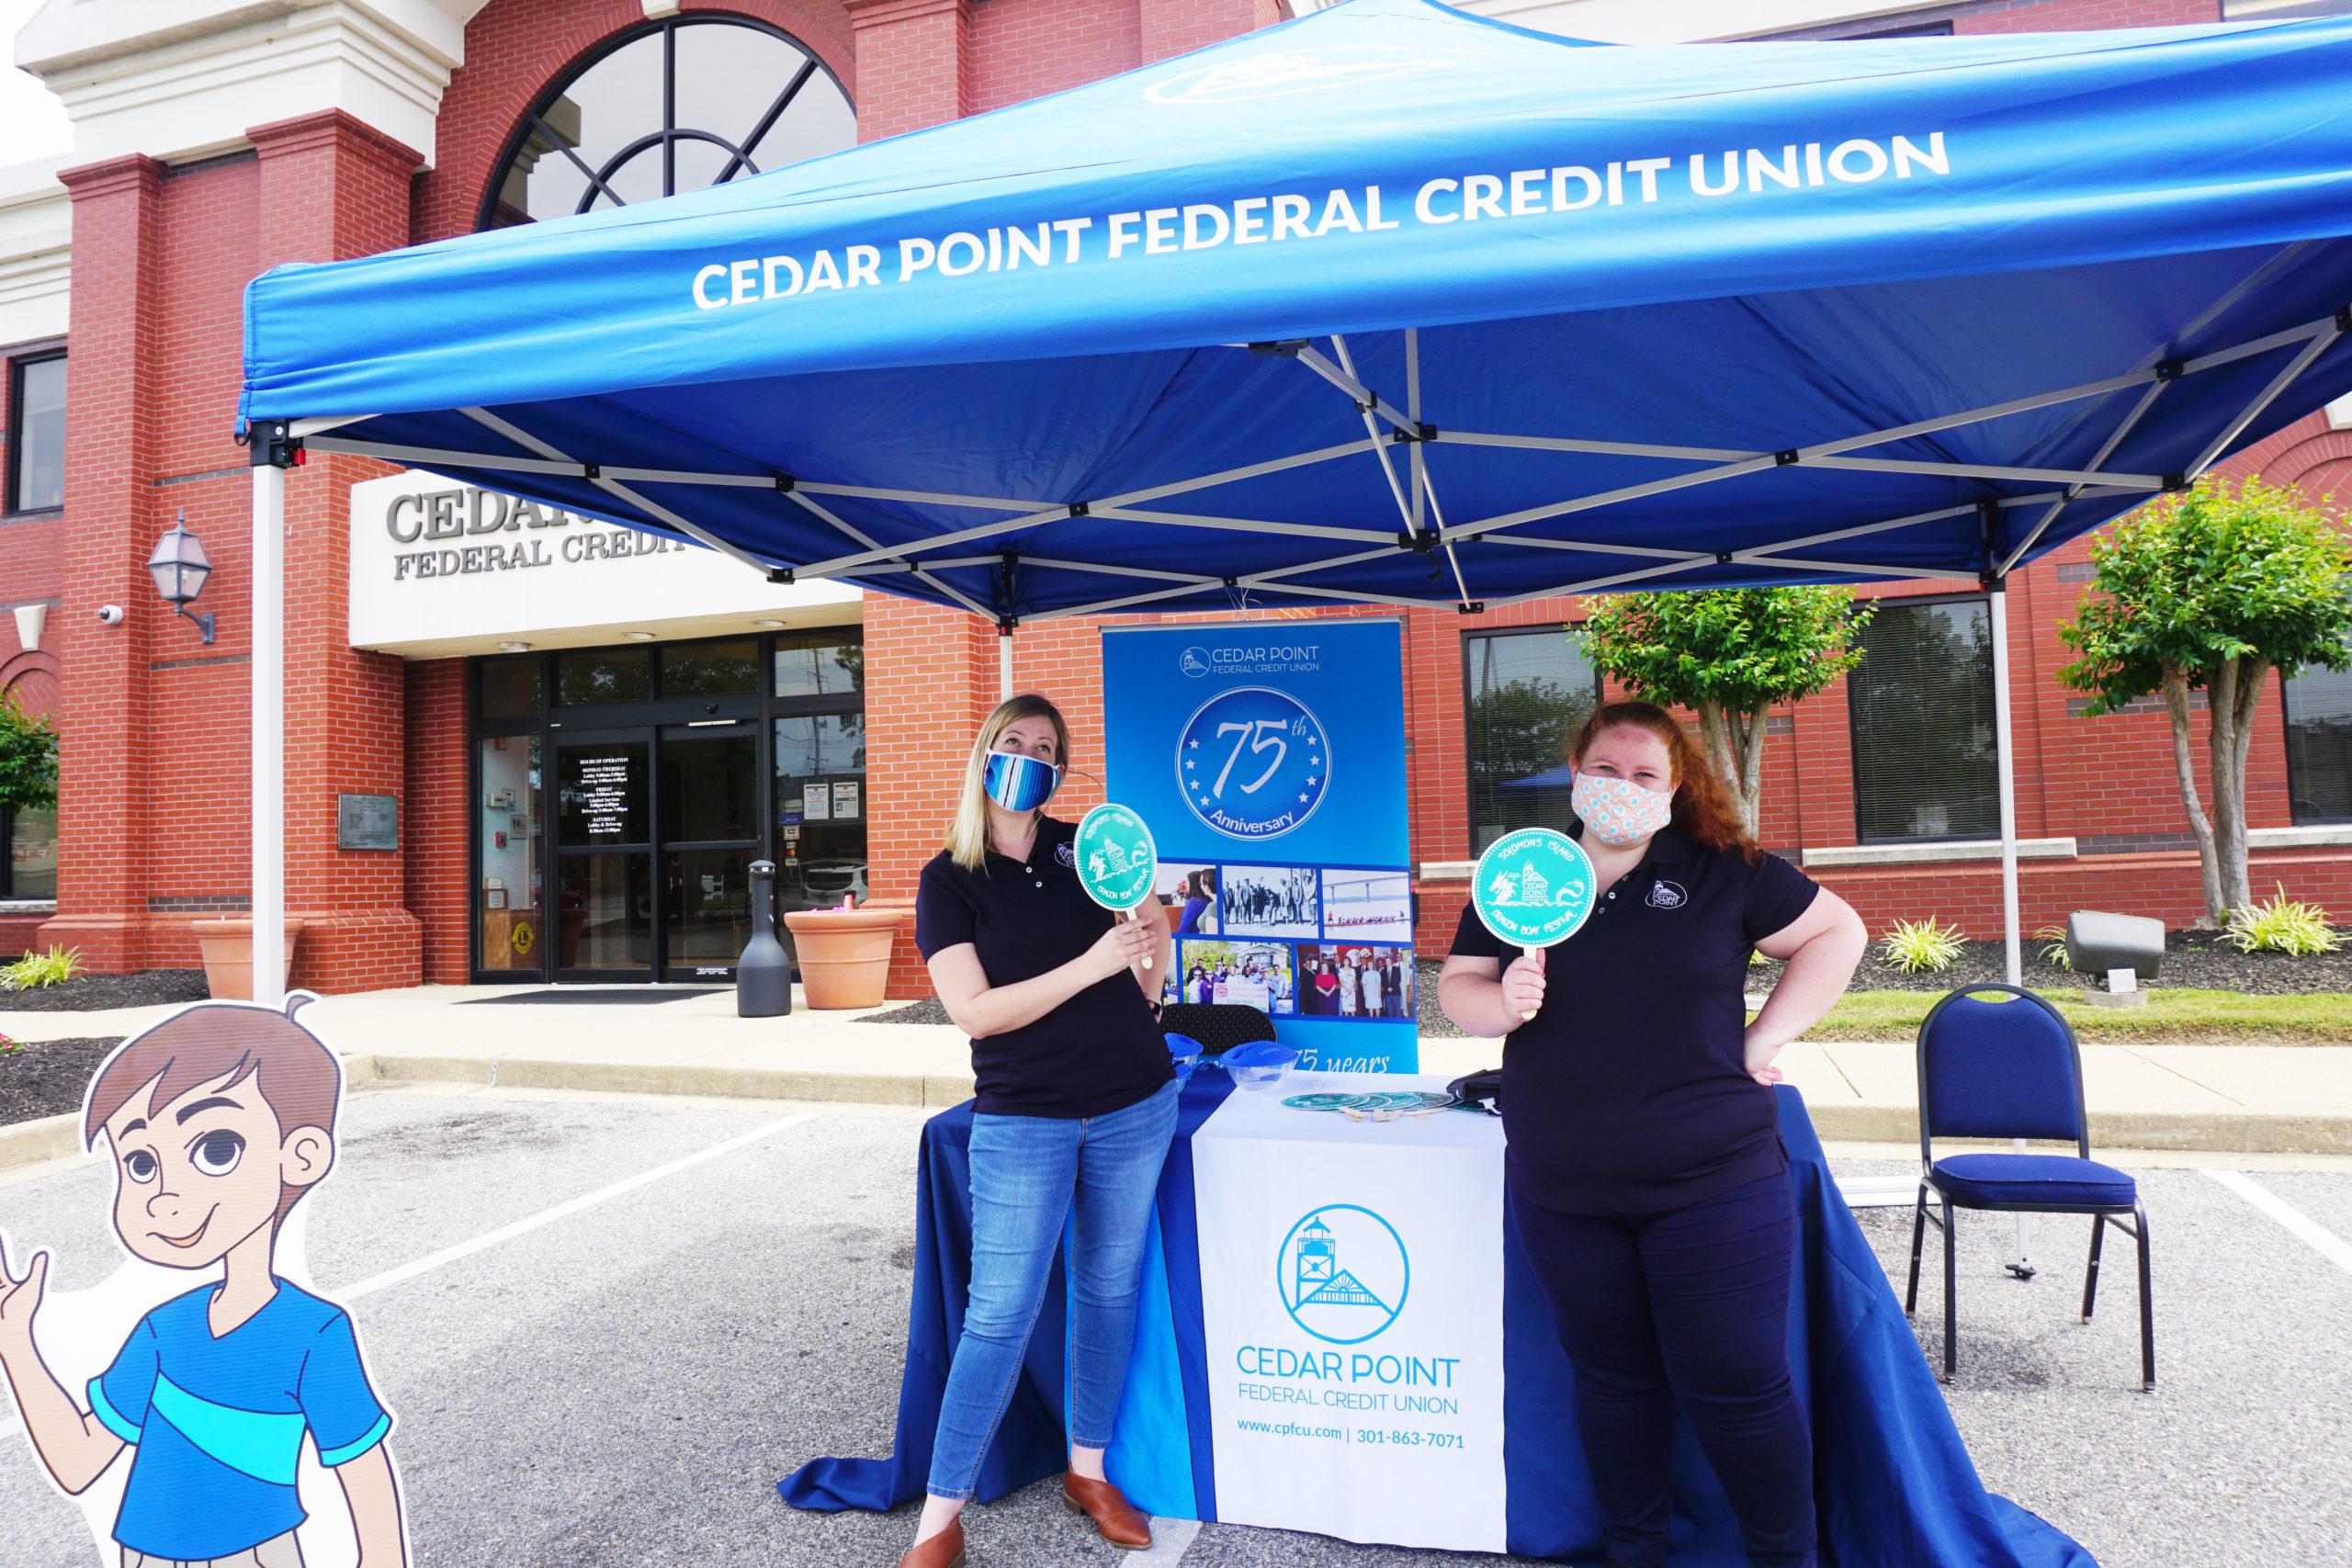 Cedar Point sponsor